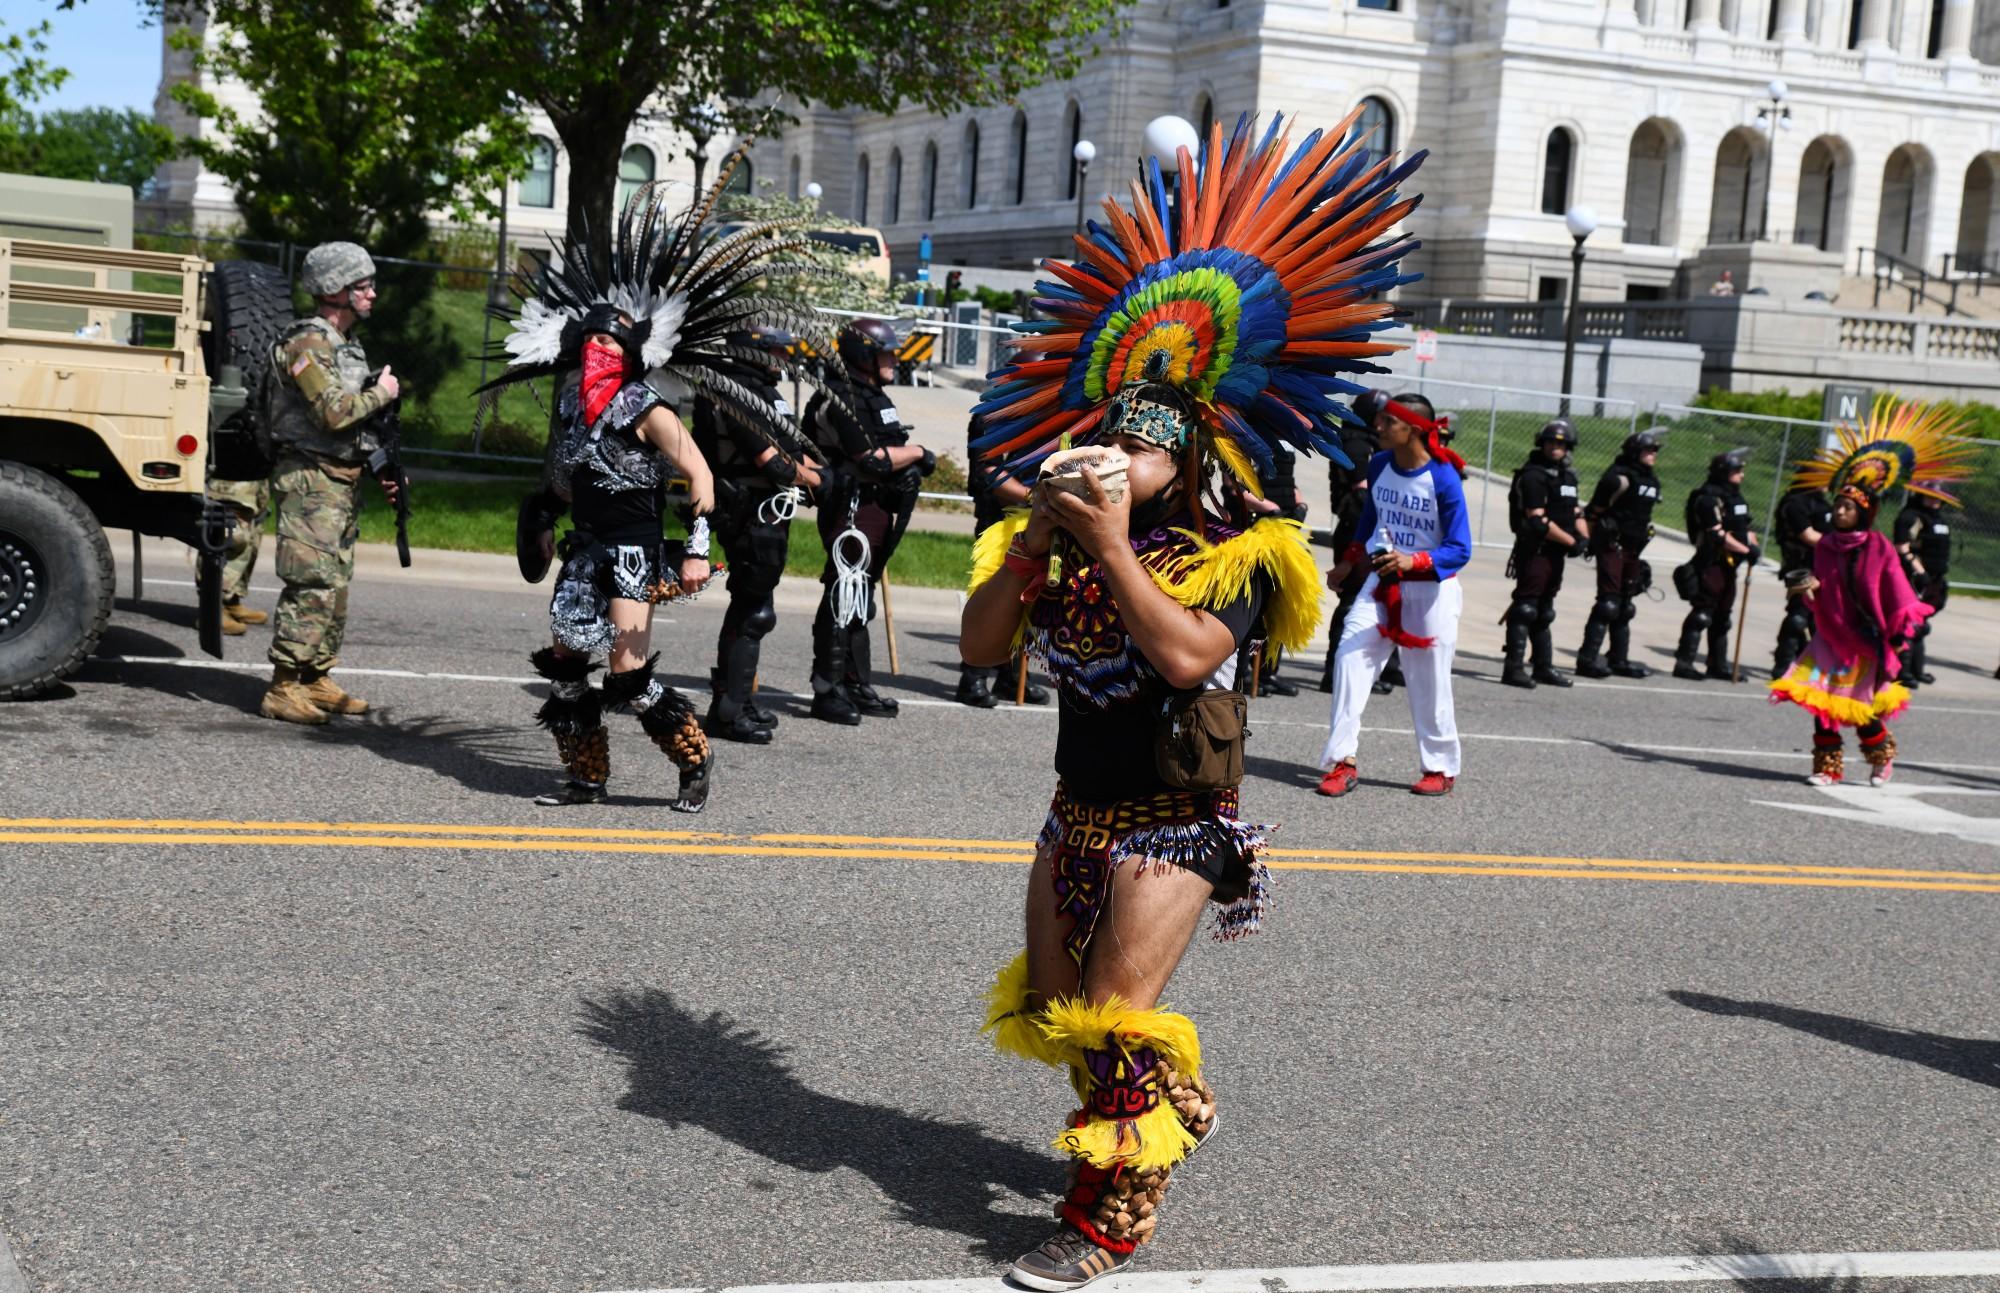 Yaocenoxtli, Huitzillin and Mexica Yolotl members lead demonstrators toward I-94 from the Minnesota State Capitol in St. Paul on Sunday, May 31.